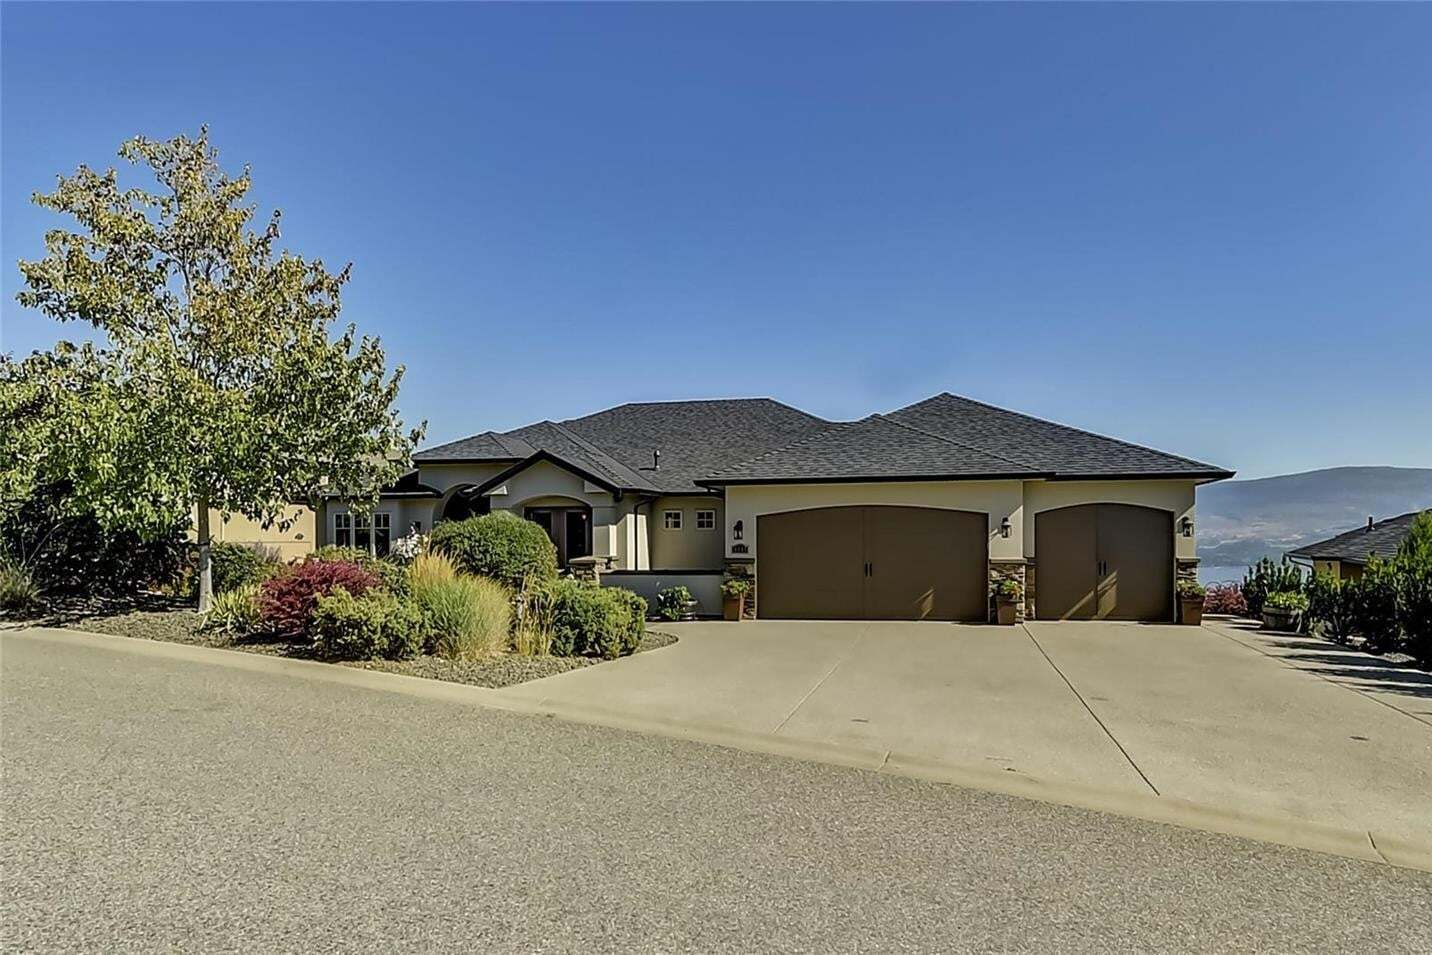 House for sale at 3267 Vineyard View Dr West Kelowna British Columbia - MLS: 10215068